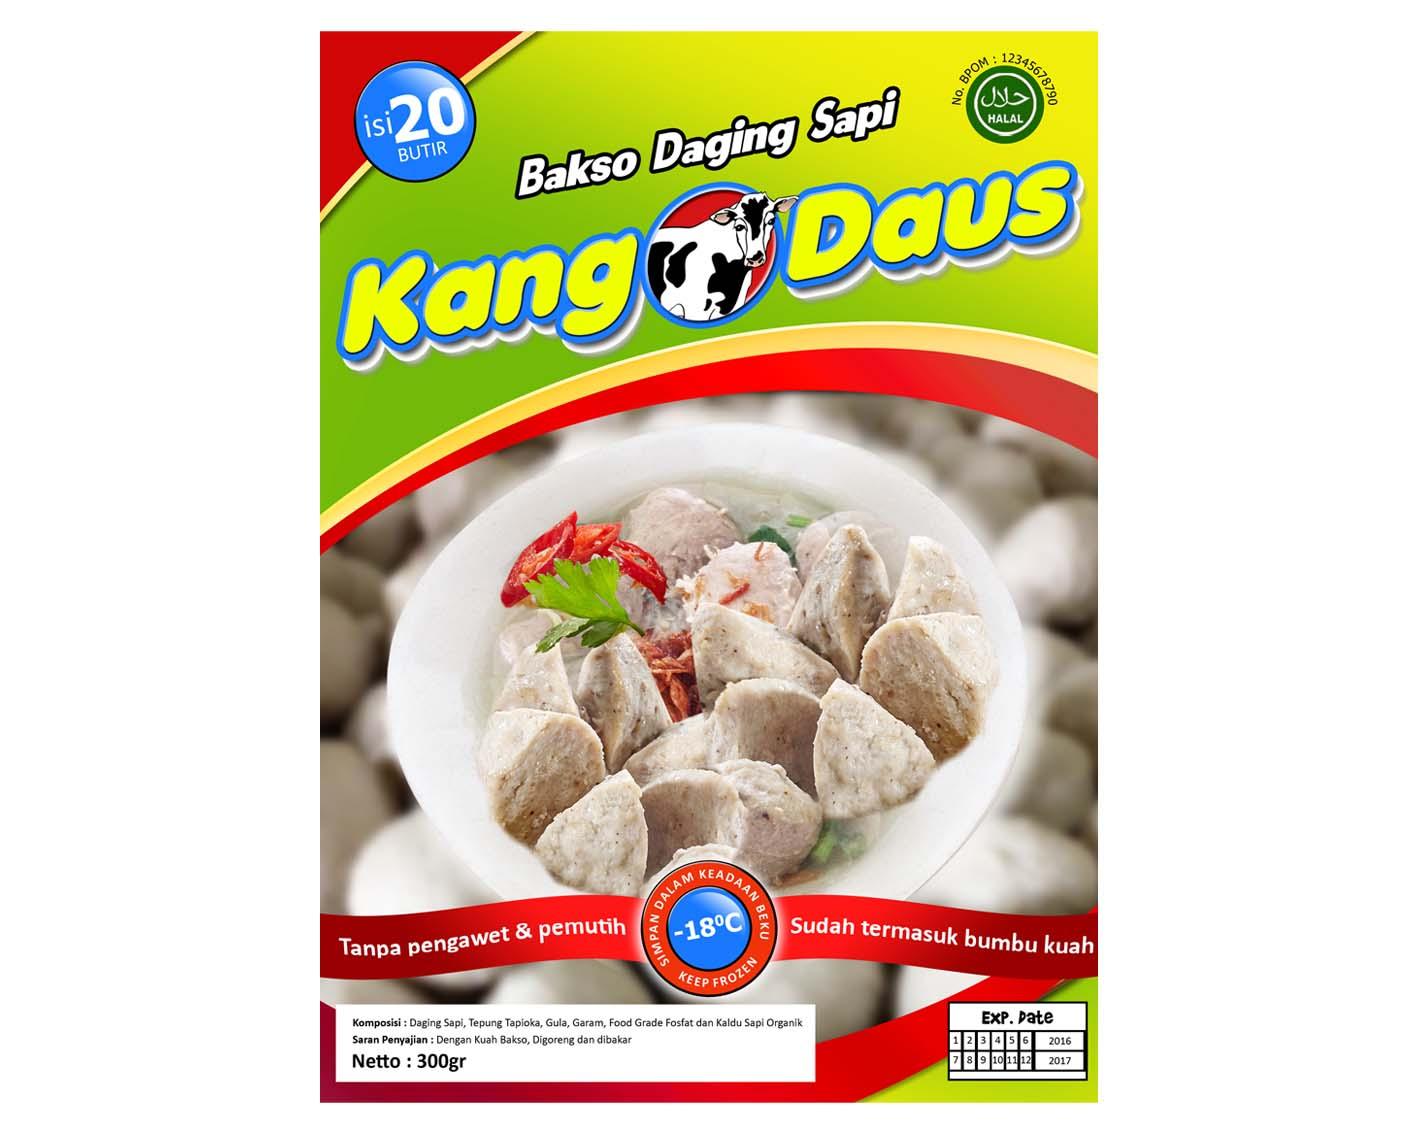 Sribu Desain Label Desain Label Bakso Daging Sapi Kang